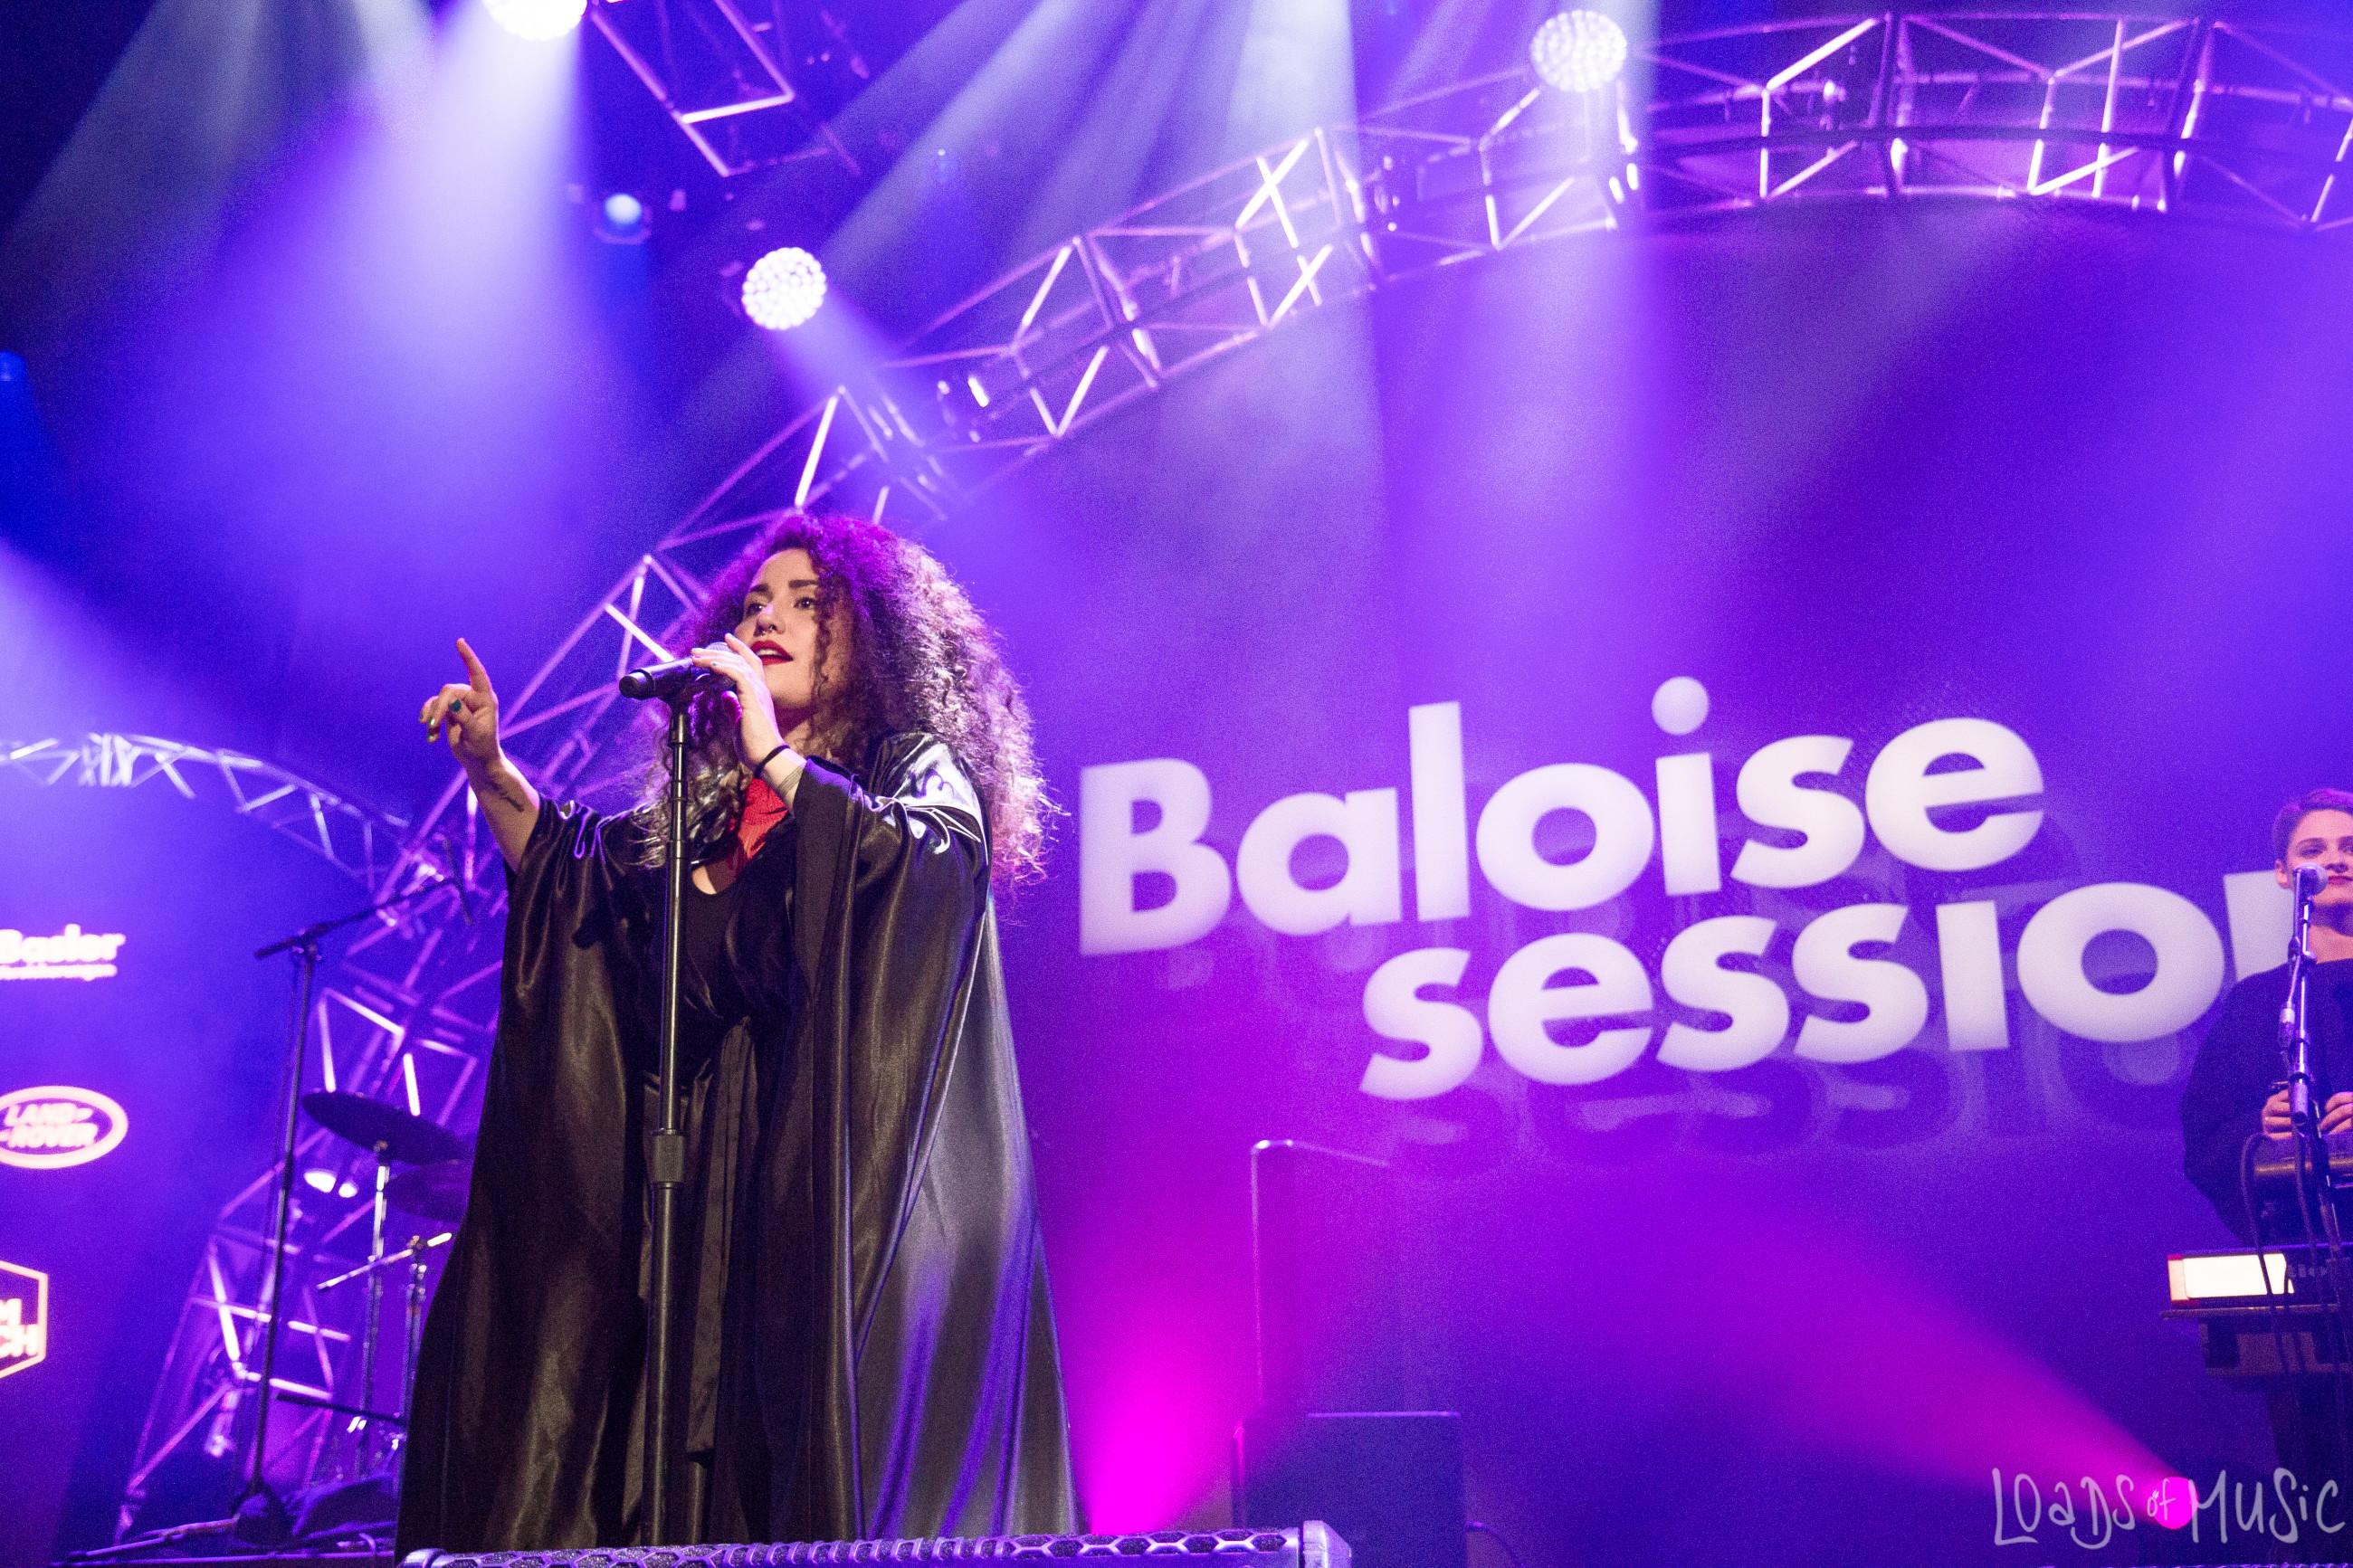 Annie_Goodchlid_Baloise_Session_16